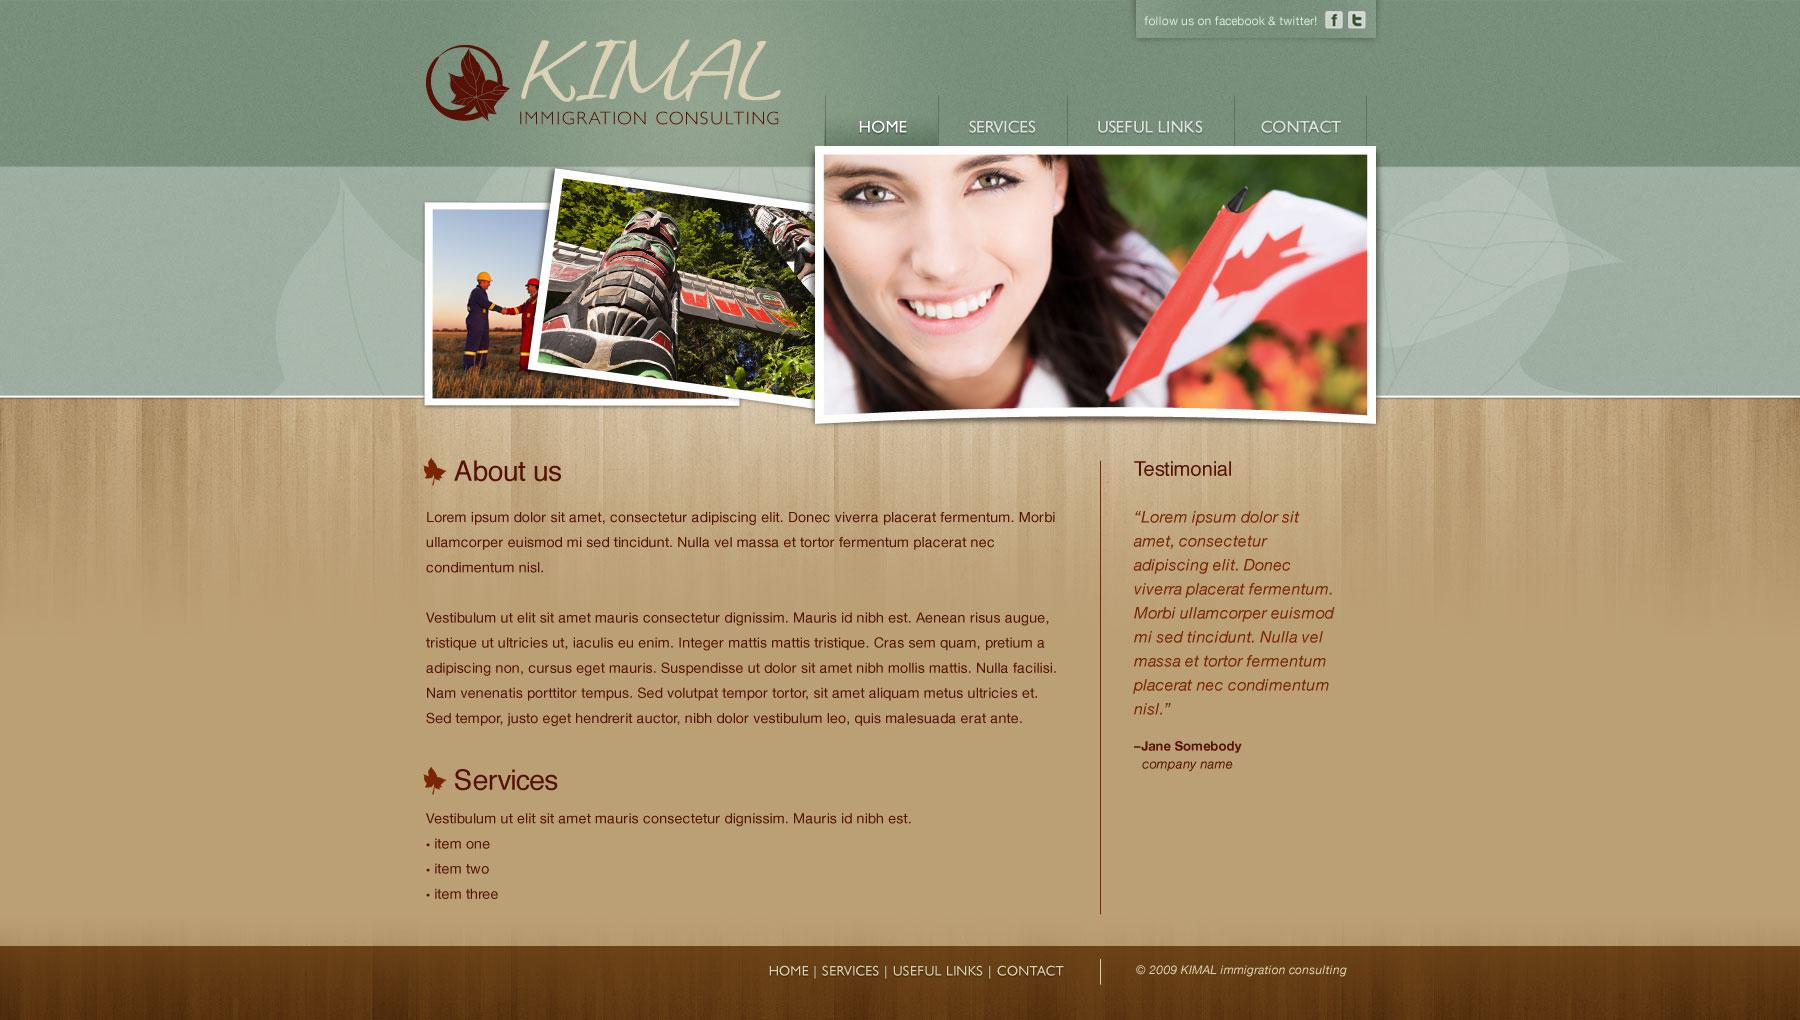 13 Professional Web Design Images